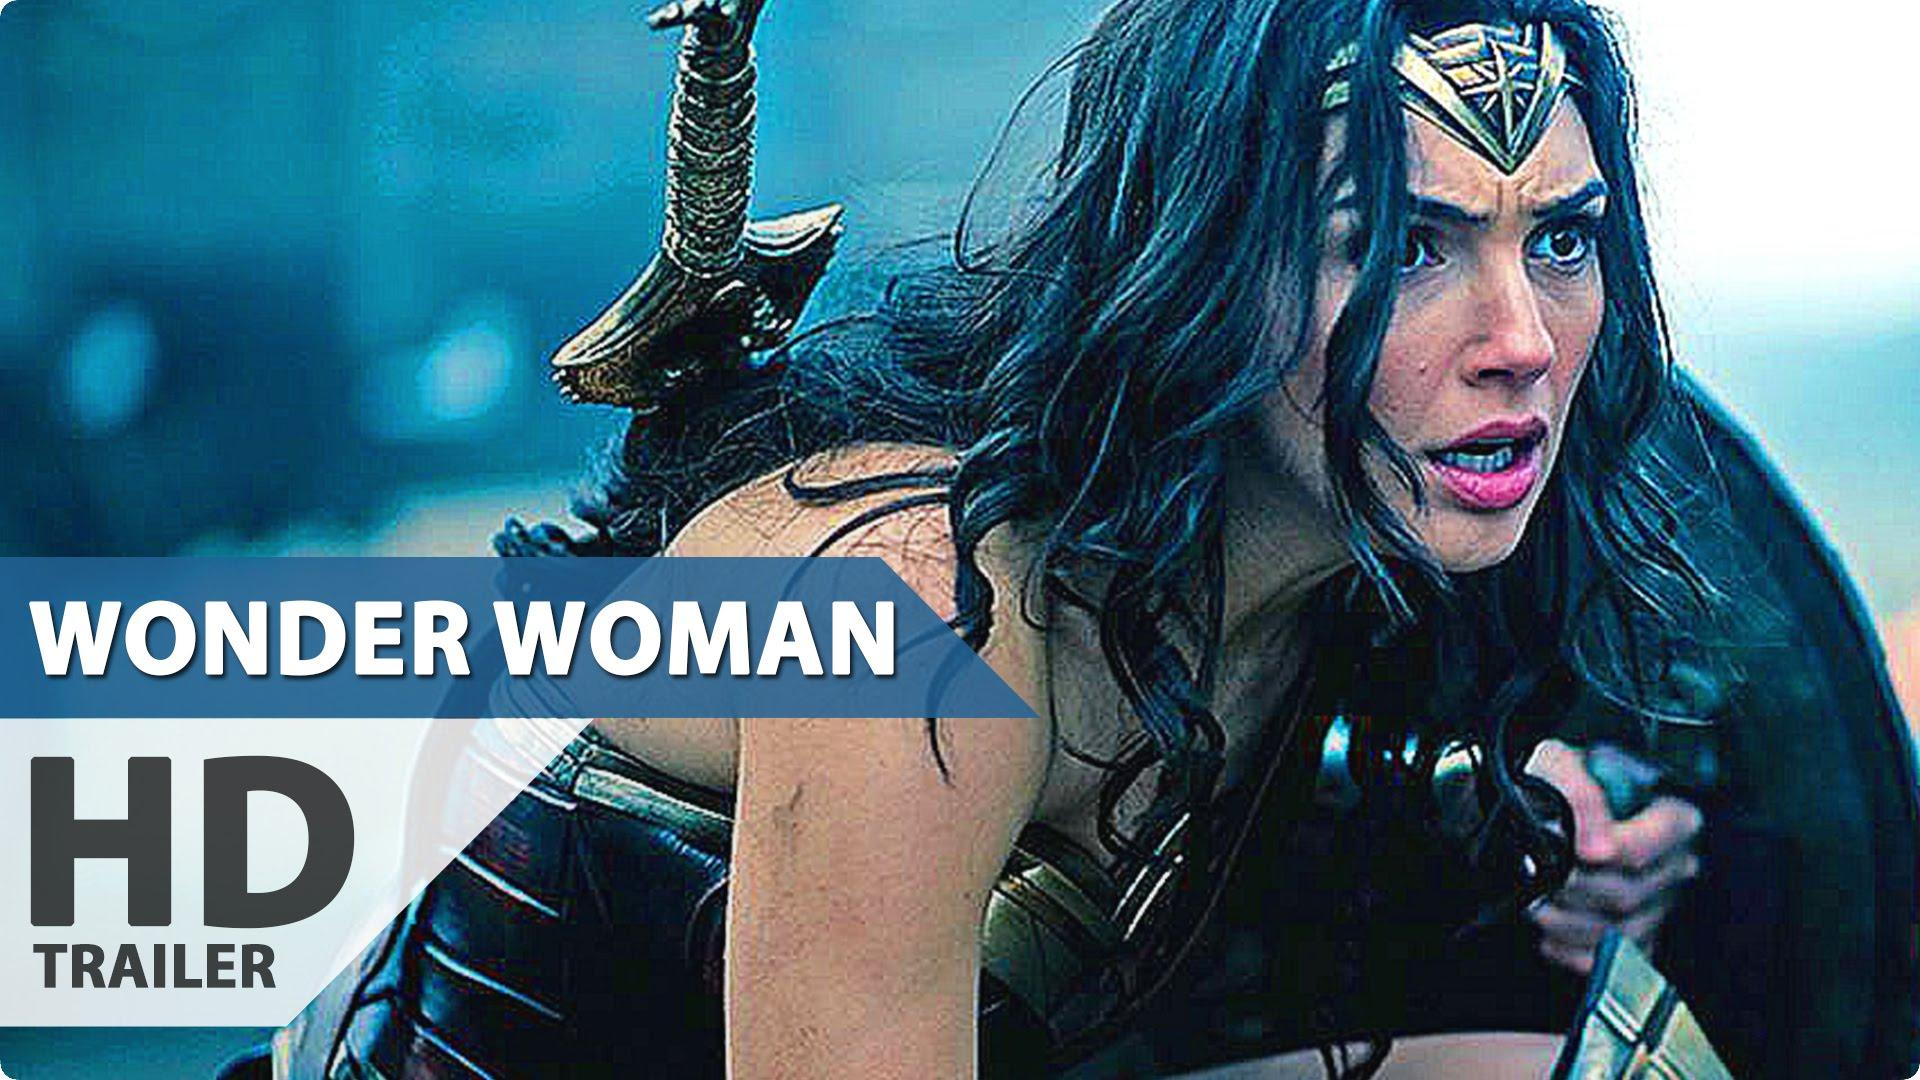 film wonder woman ivid tv online streaming italia gratis guarda stasera trailer hd